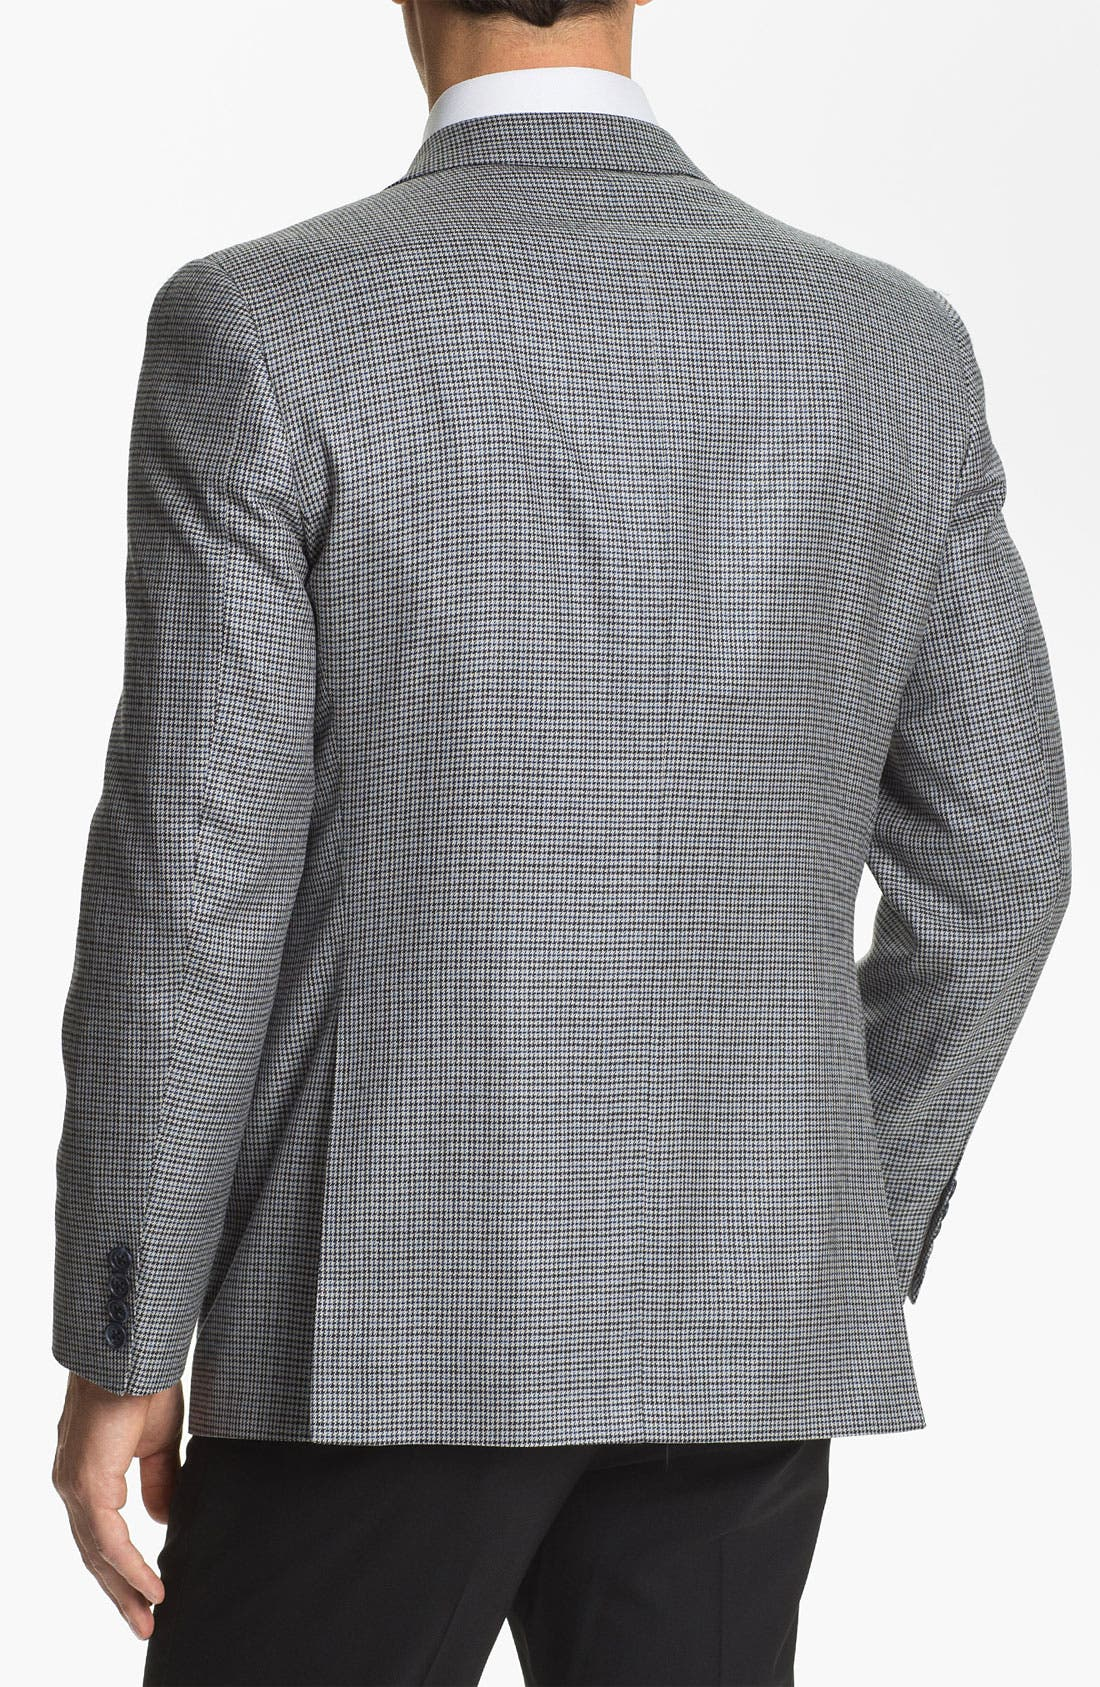 Alternate Image 2  - Joseph Abboud 'Profile' Trim Fit Check Sportcoat